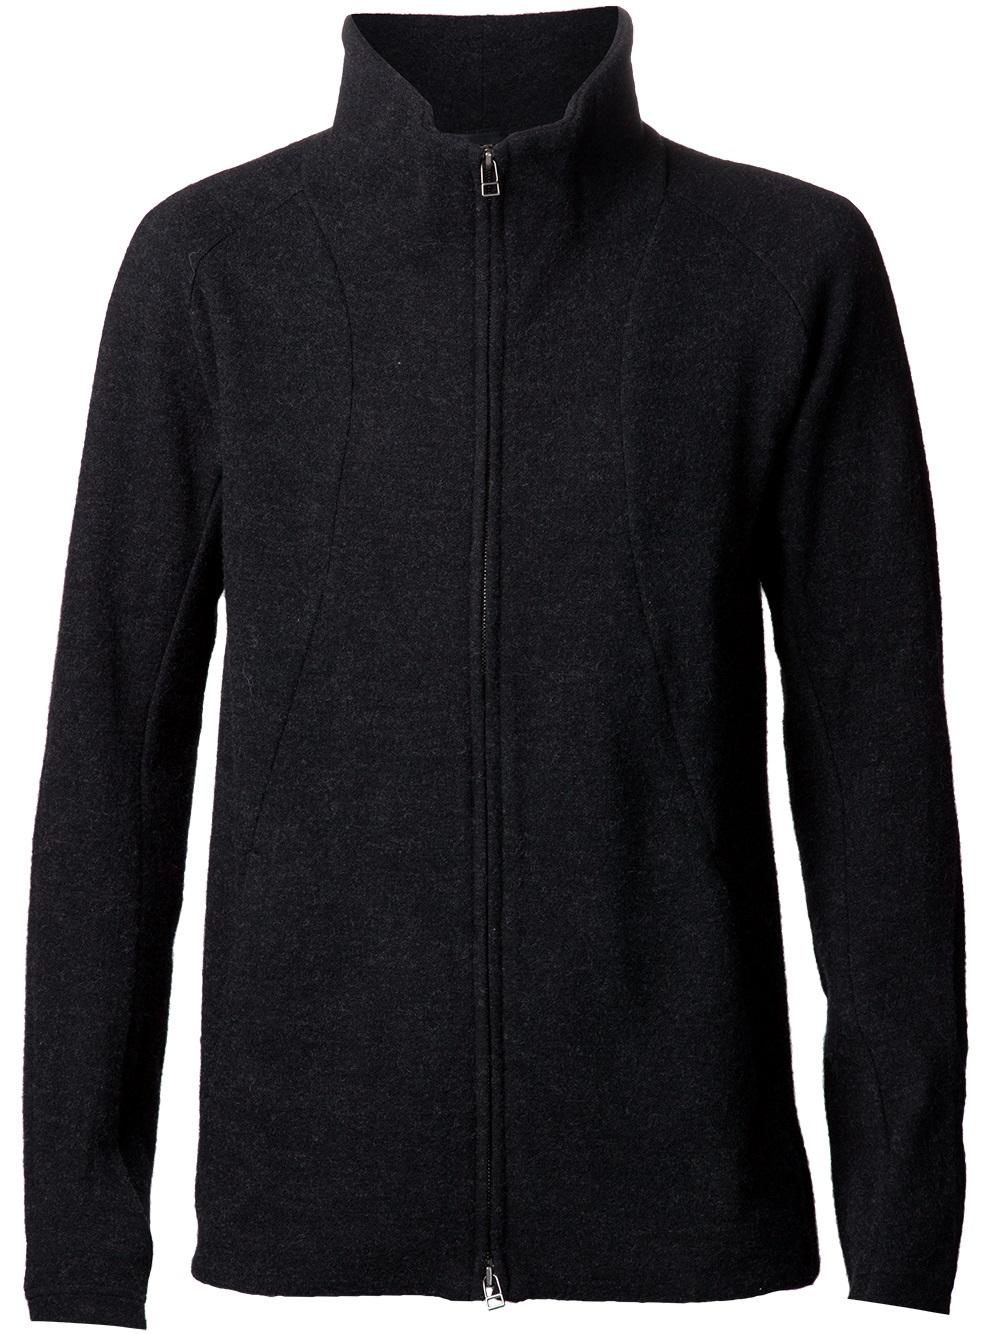 The viridi-anne Zip Up Cardigan in Black for Men